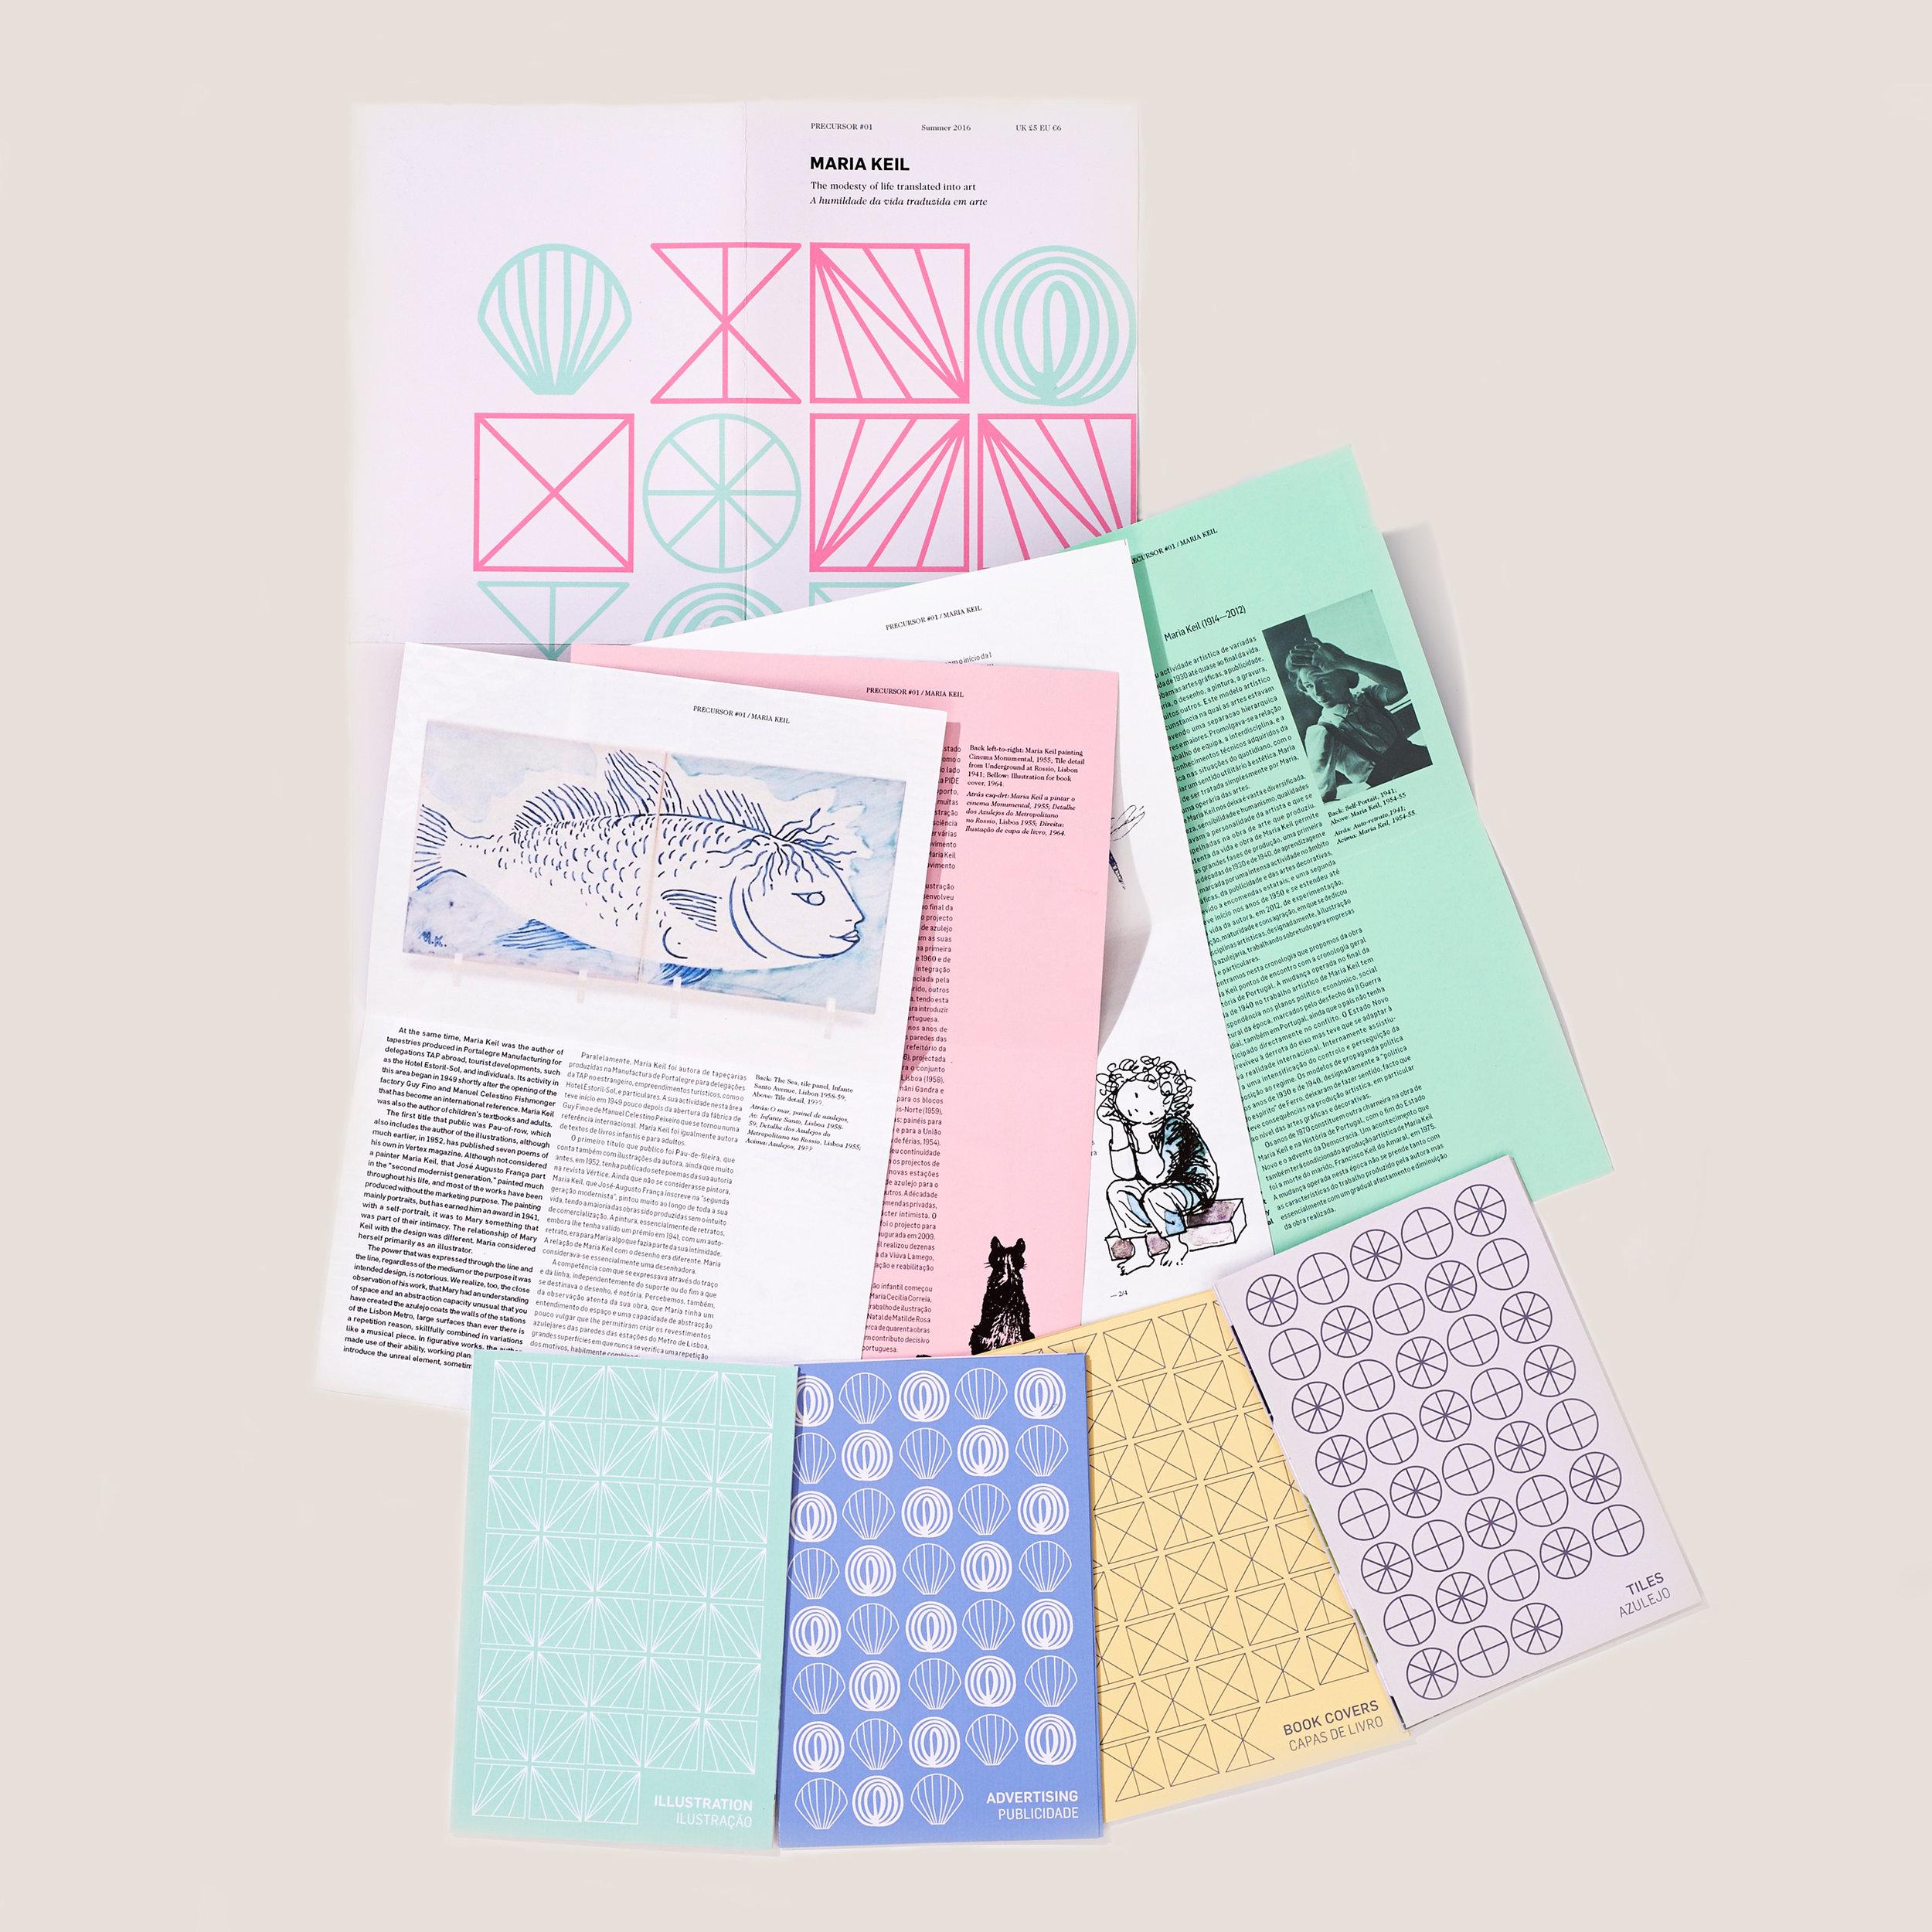 #2 - Precursor / Design Concept for Print and Digital Repository of Portuguese Art and Architecture / Illustration: Maria Keil